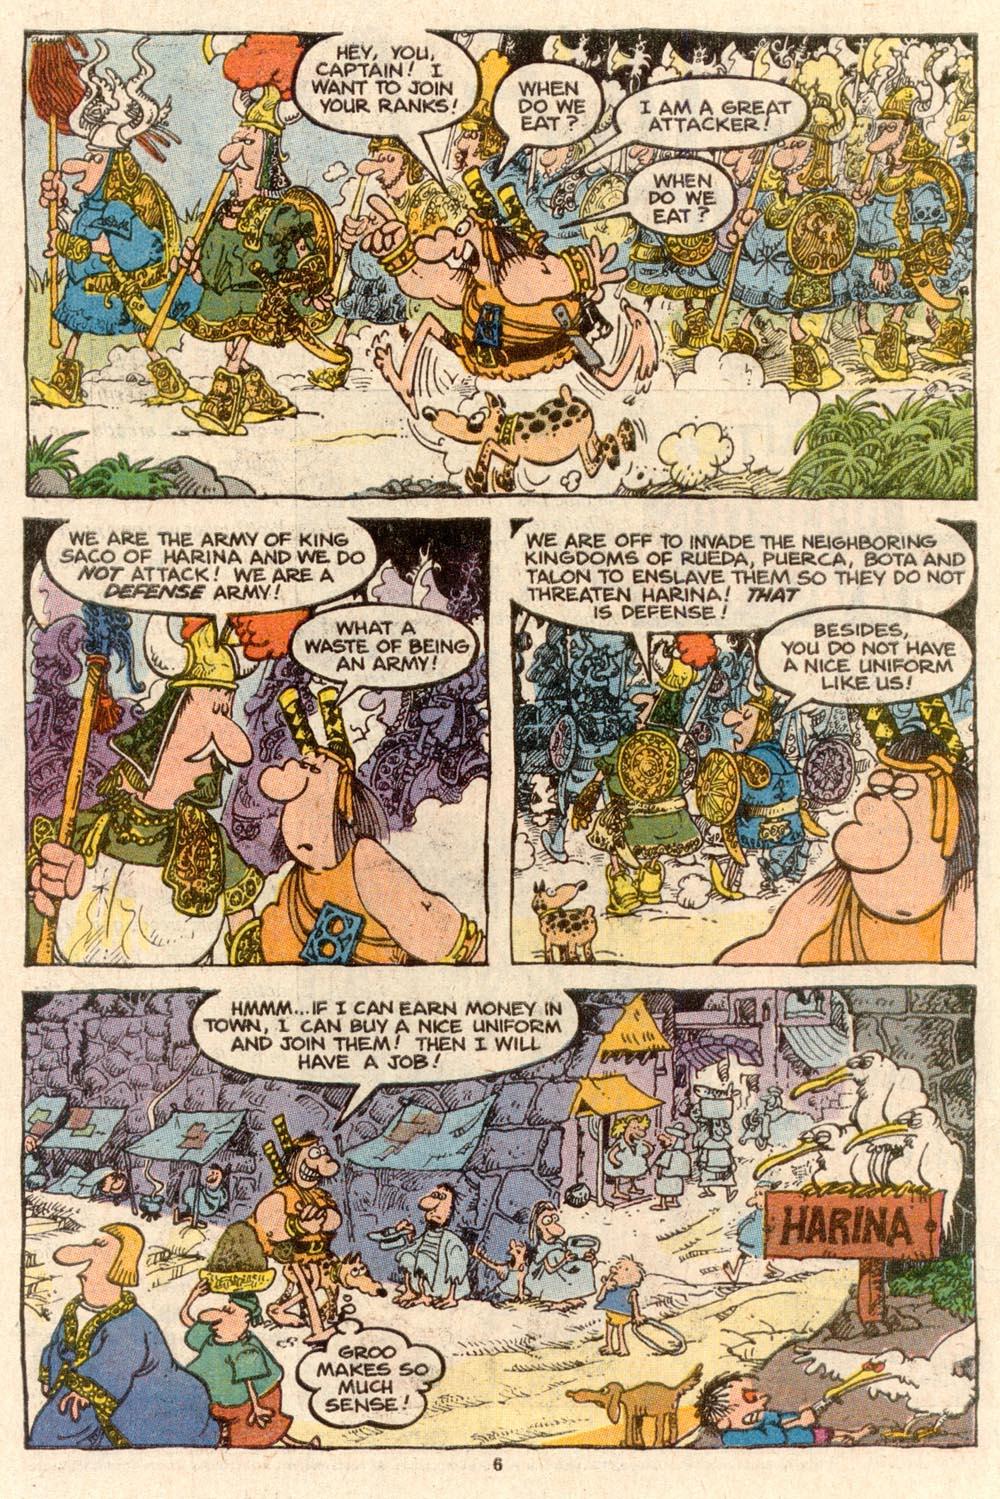 Read online Sergio Aragonés Groo the Wanderer comic -  Issue #60 - 6